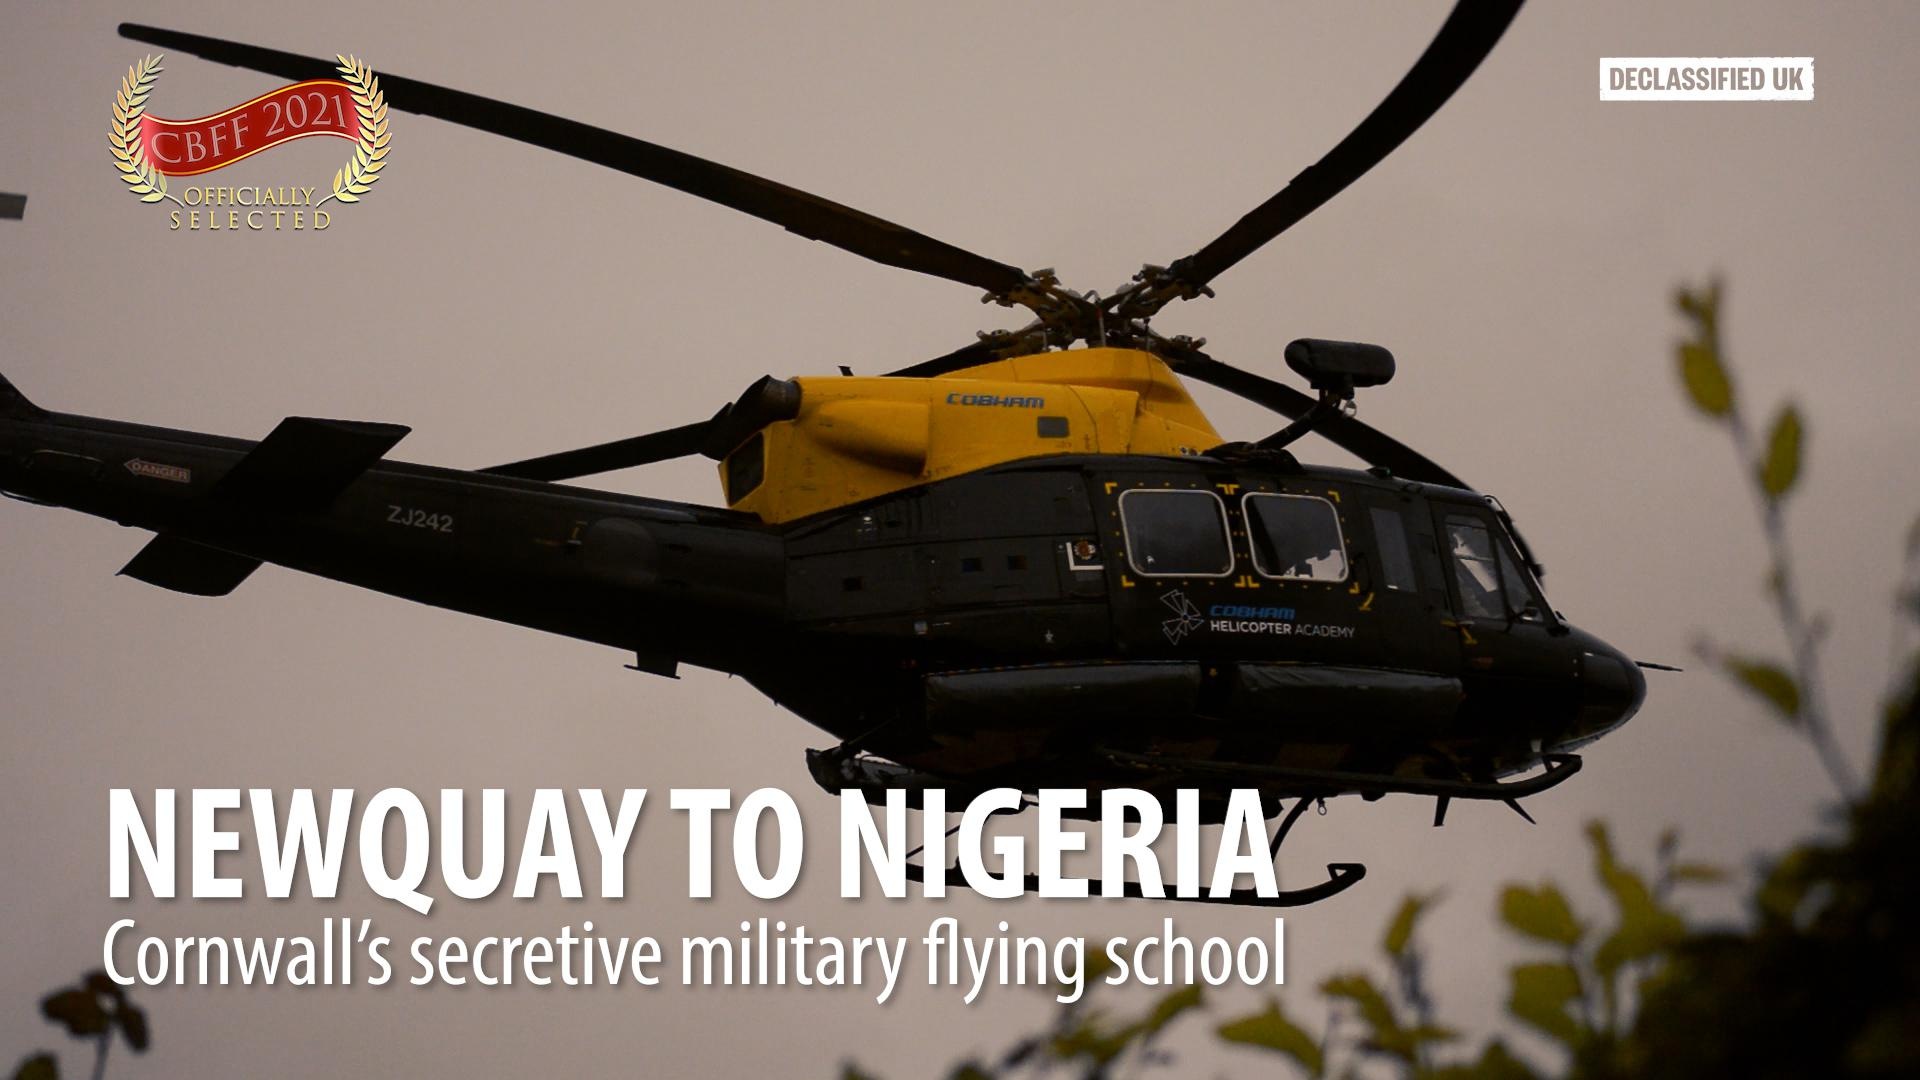 Newquay to Nigeria: Cornwall's secretive military flying school